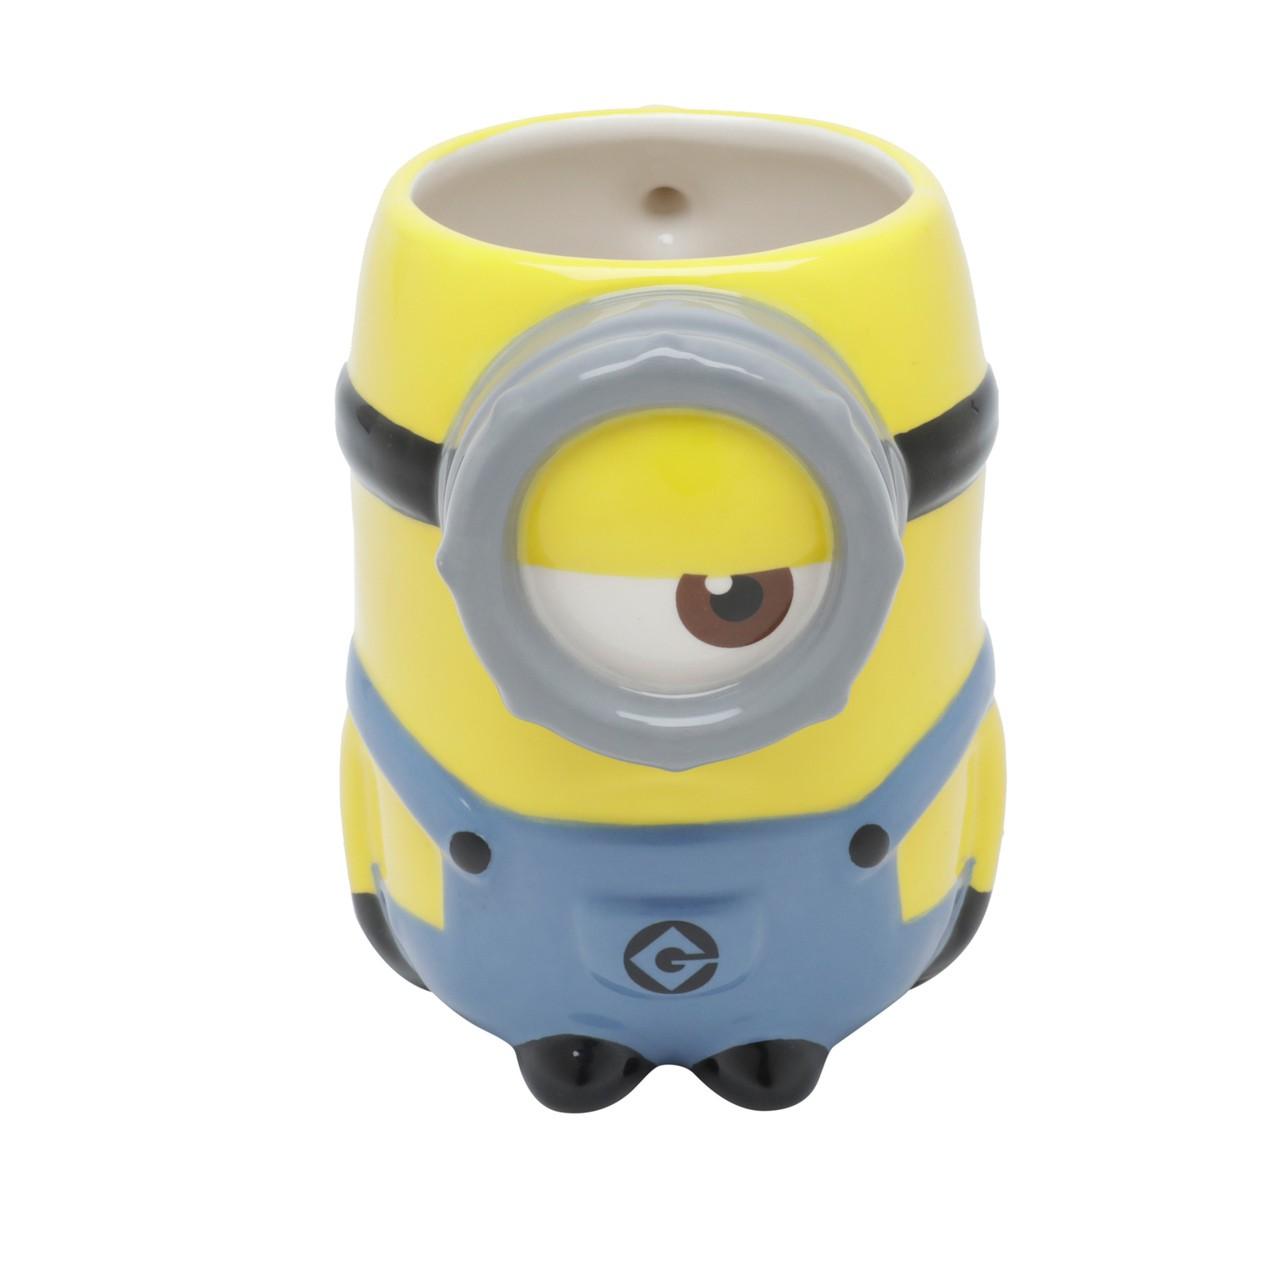 Caneca Minions 3D Licenciada - 400 ml